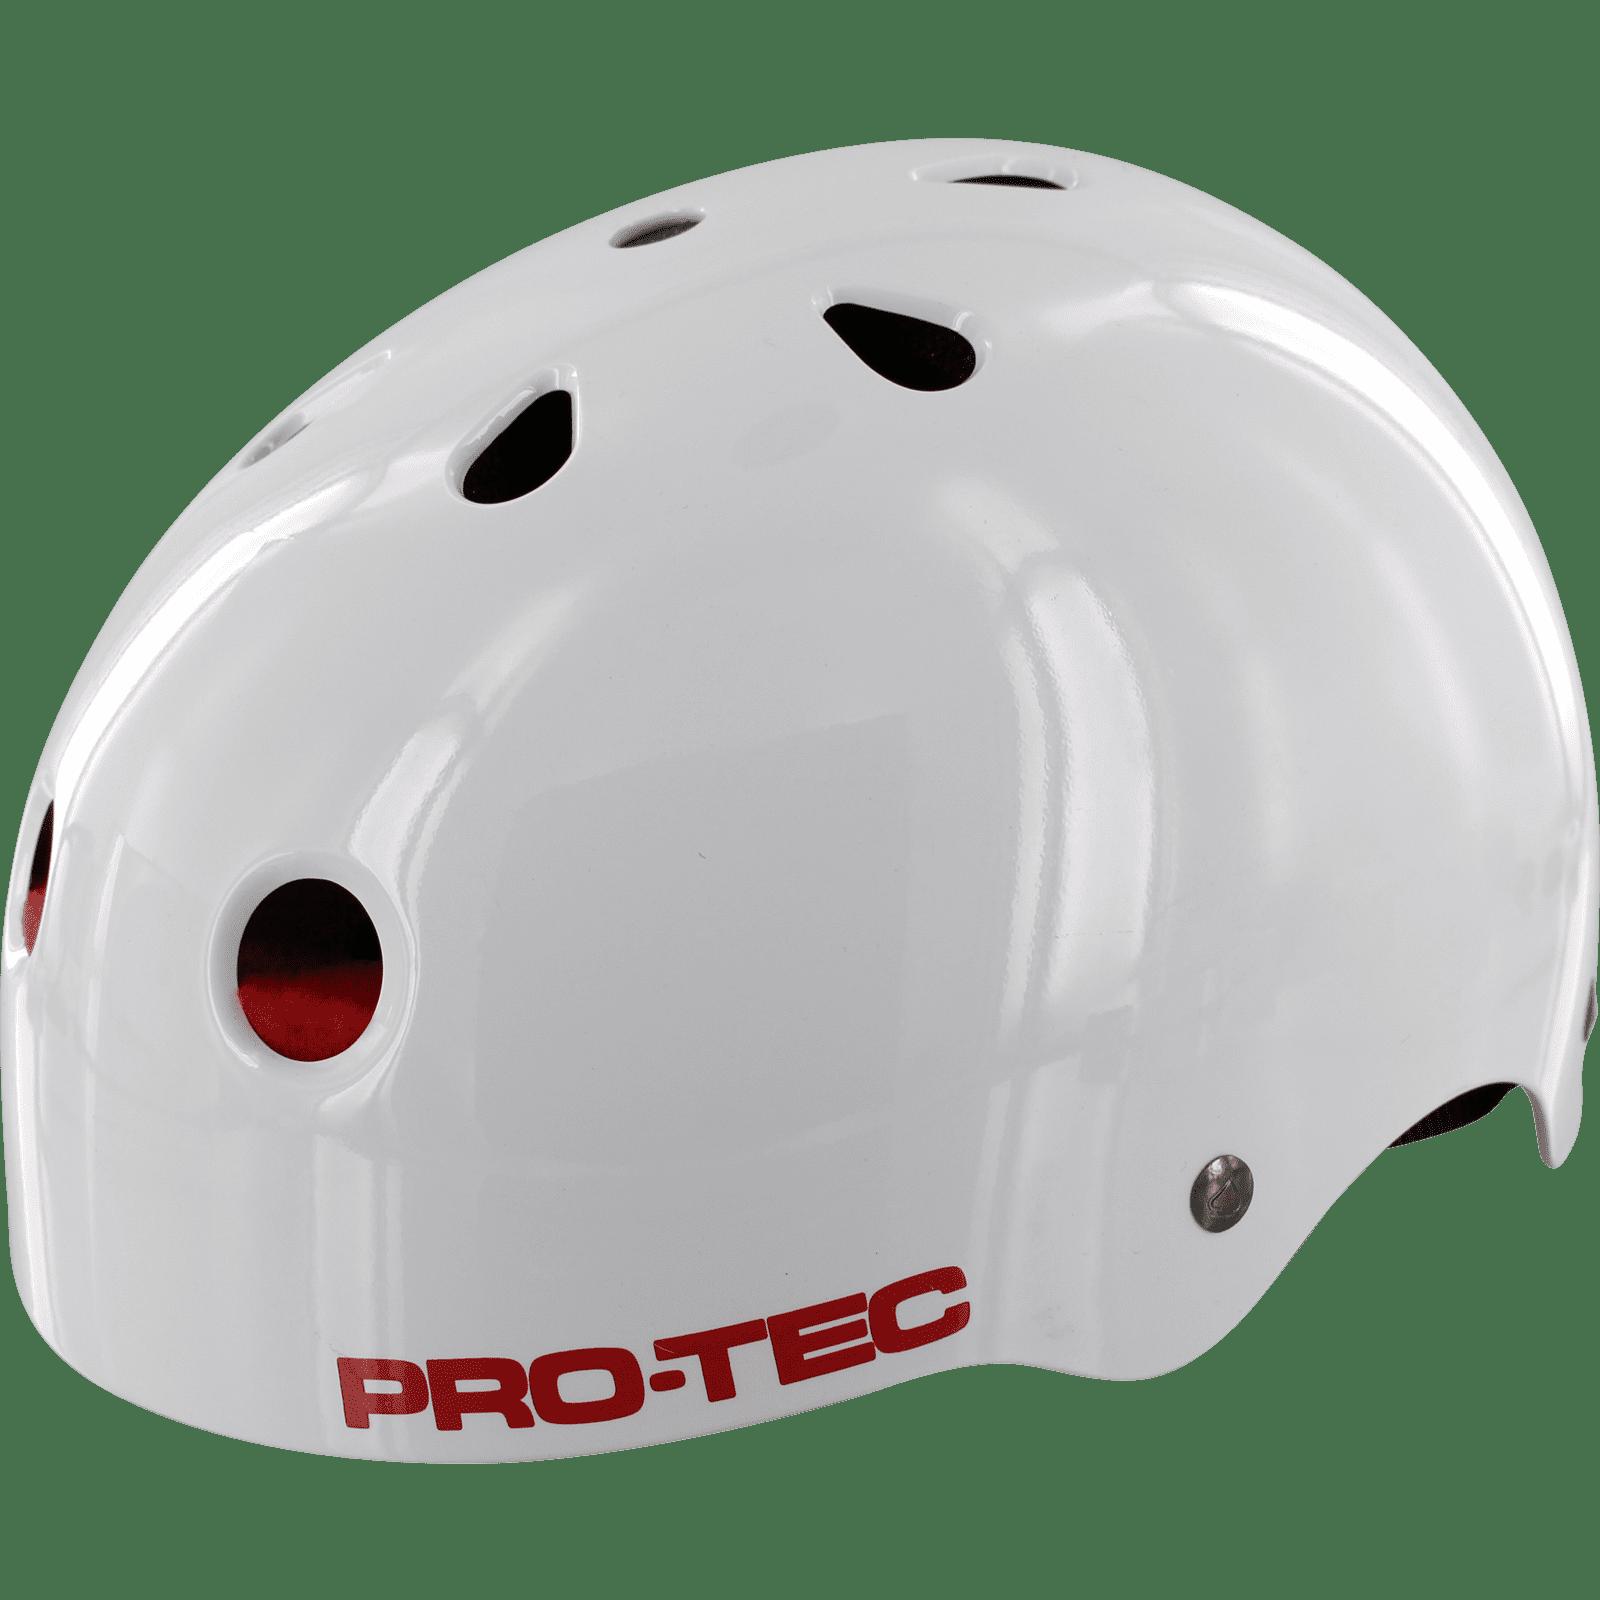 Protec (CPSC) Cab Classic - LARGE Gloss White Dragon Helmet